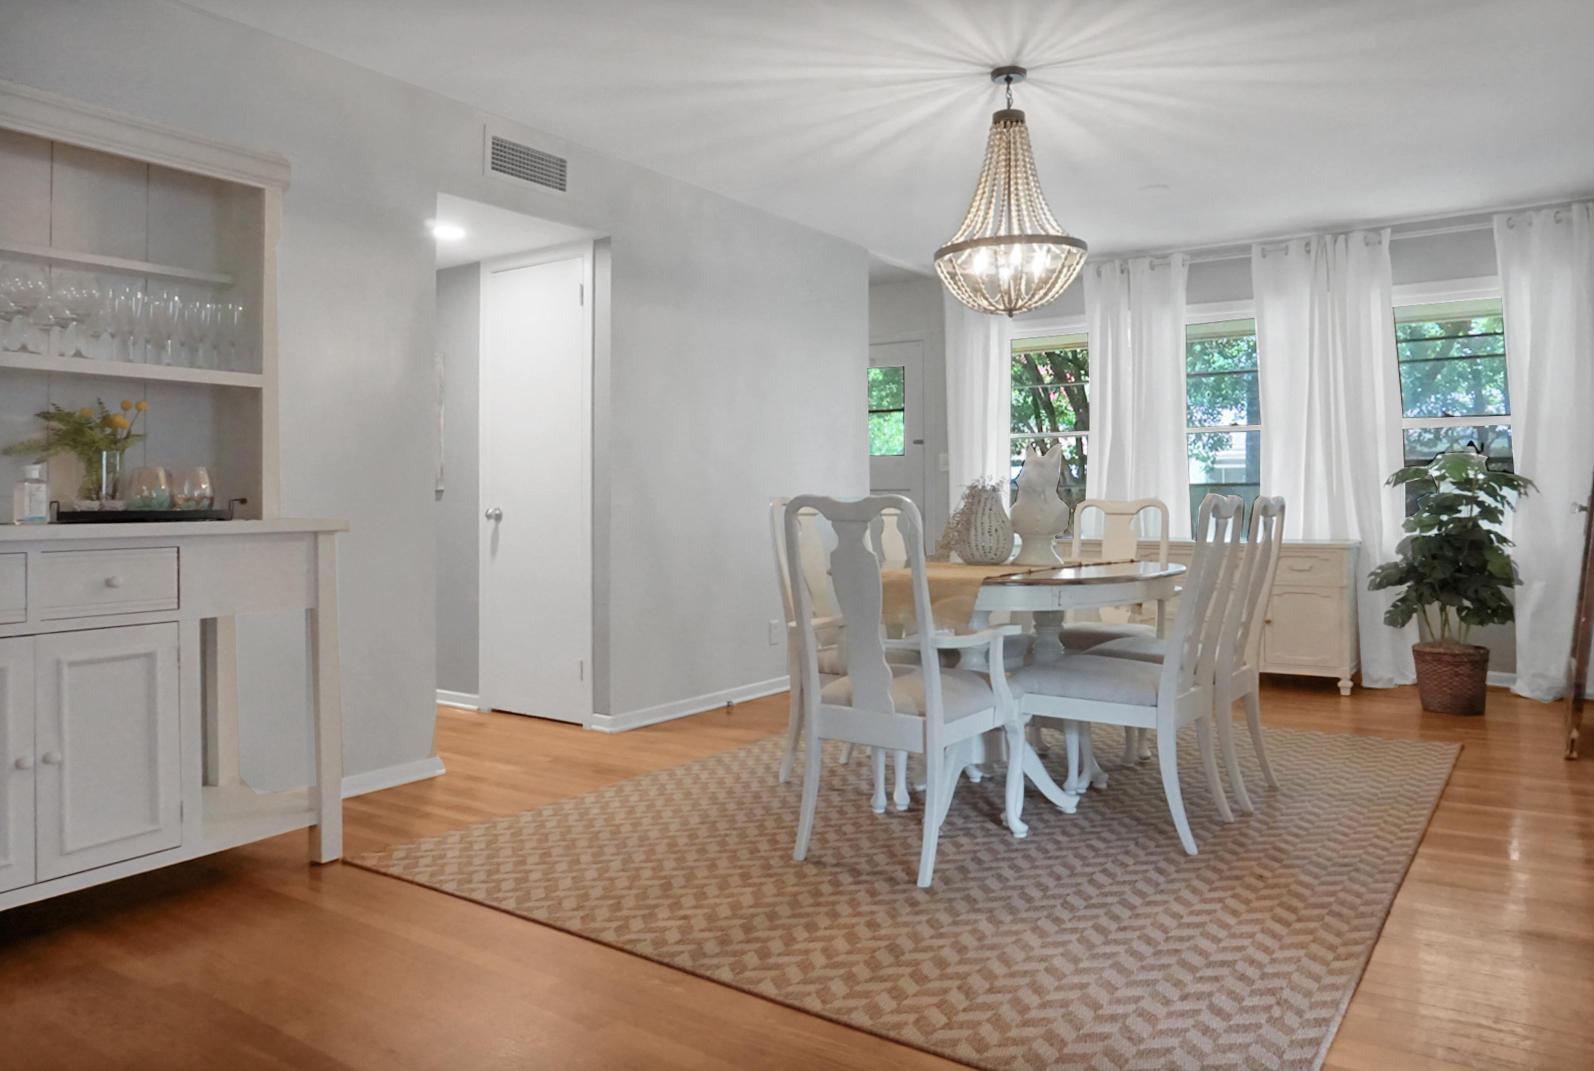 Oakland Homes For Sale - 408 Arlington, Charleston, SC - 21